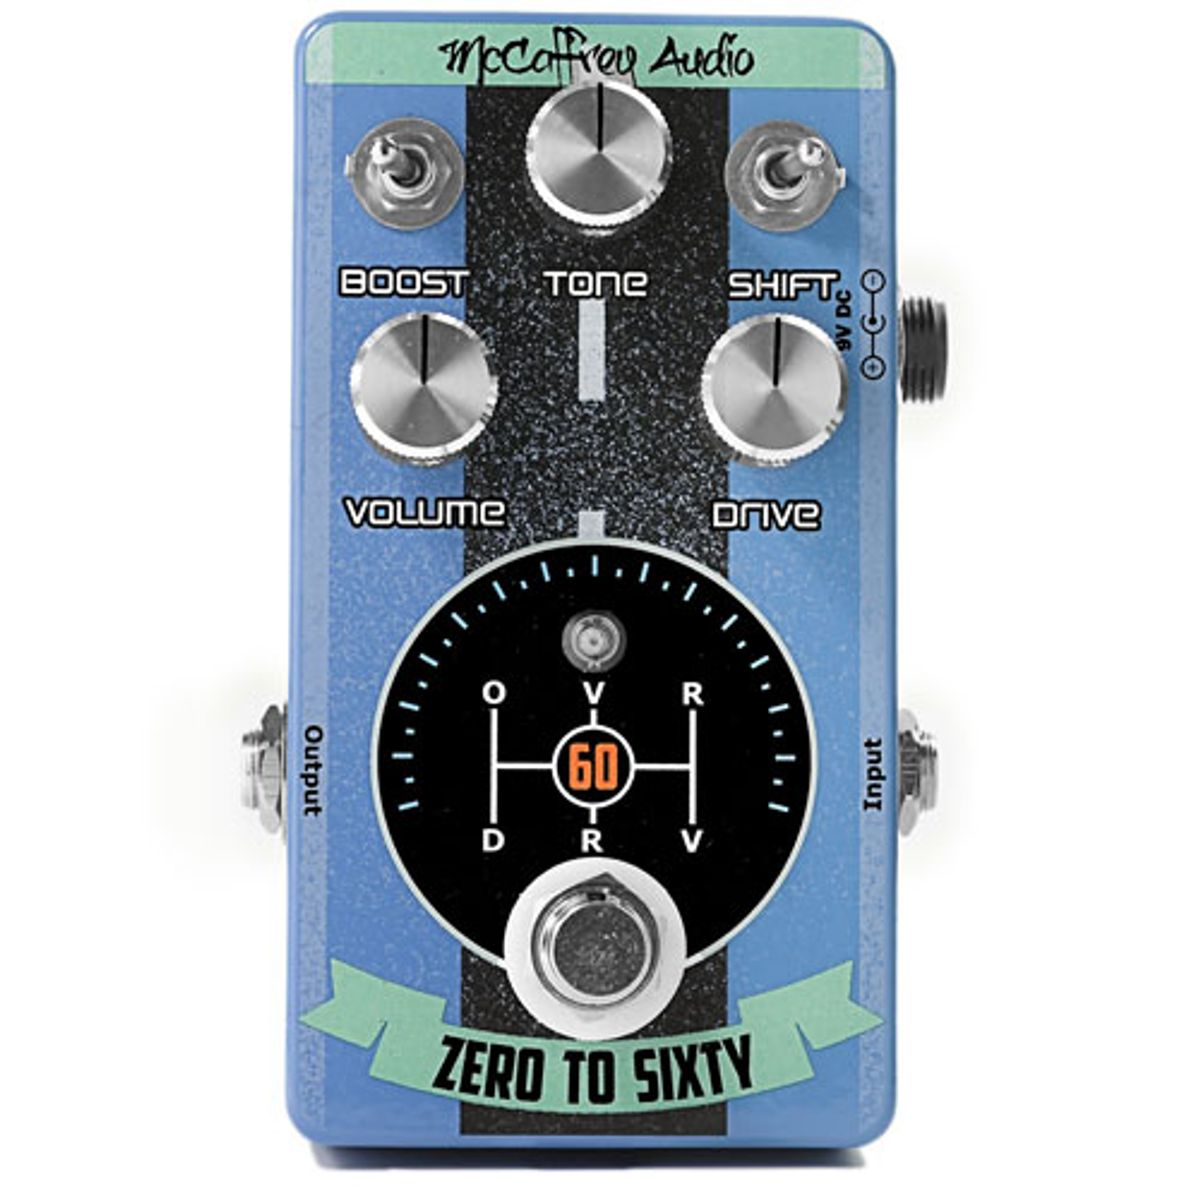 McCaffrey Audio Releases the Zero to Sixty Drive